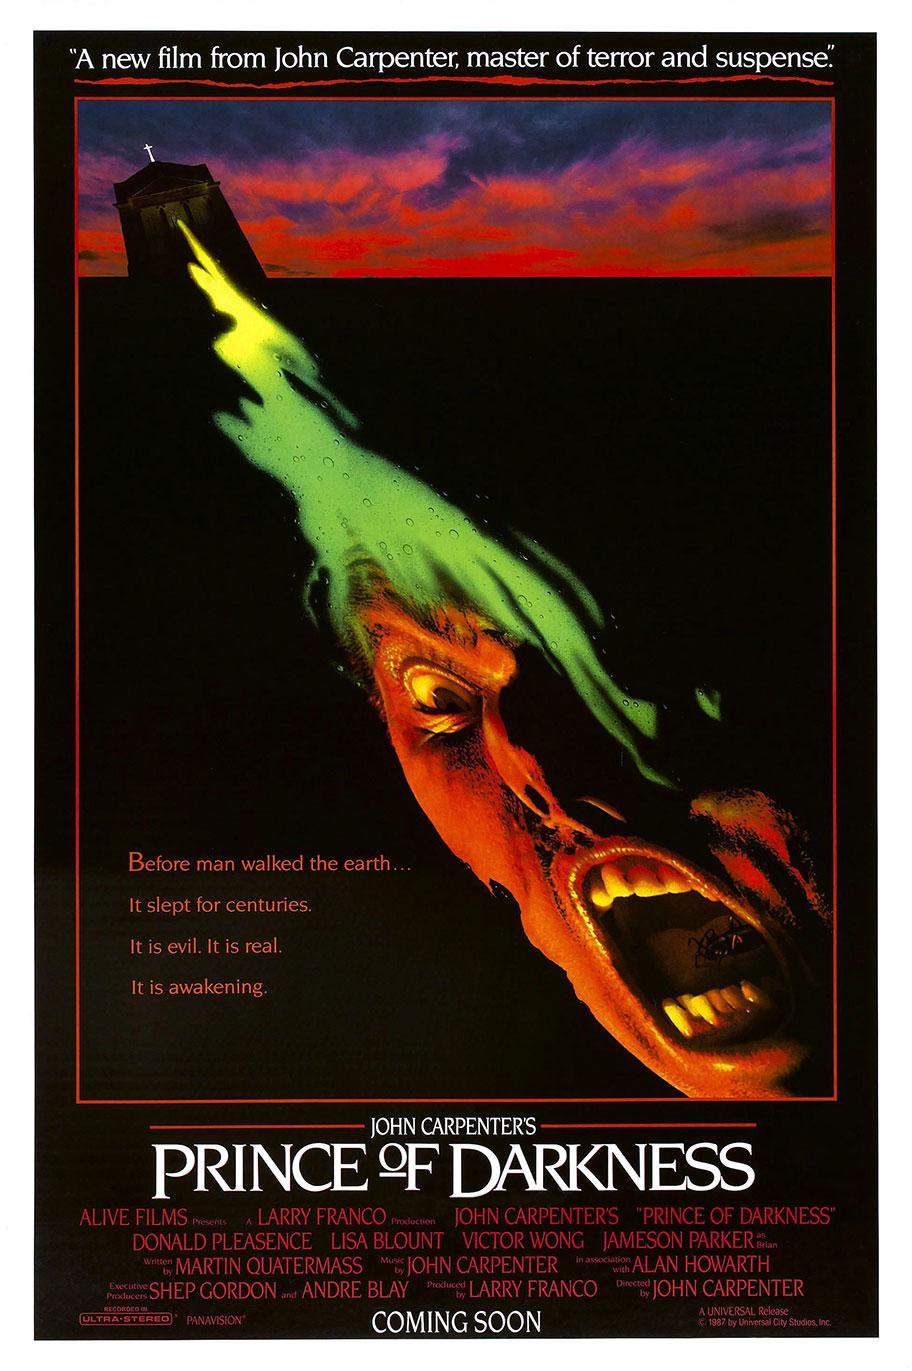 john-carpenter-prince-of-darkness-poster.jpg